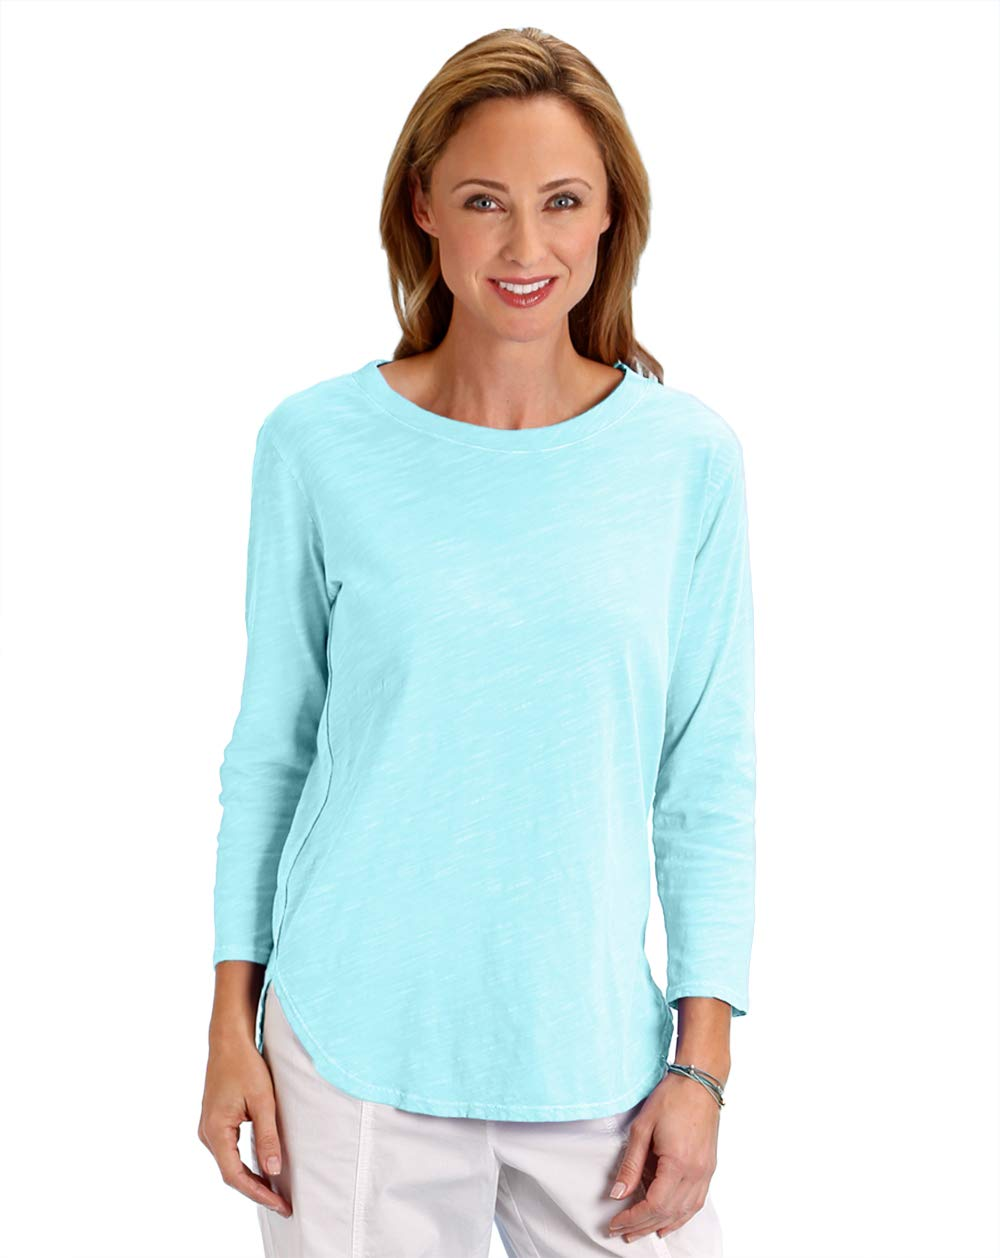 Fresh Produce Womens Comfortable Casual Summer Beach Scoop Neck Cotton Catalina Shirt